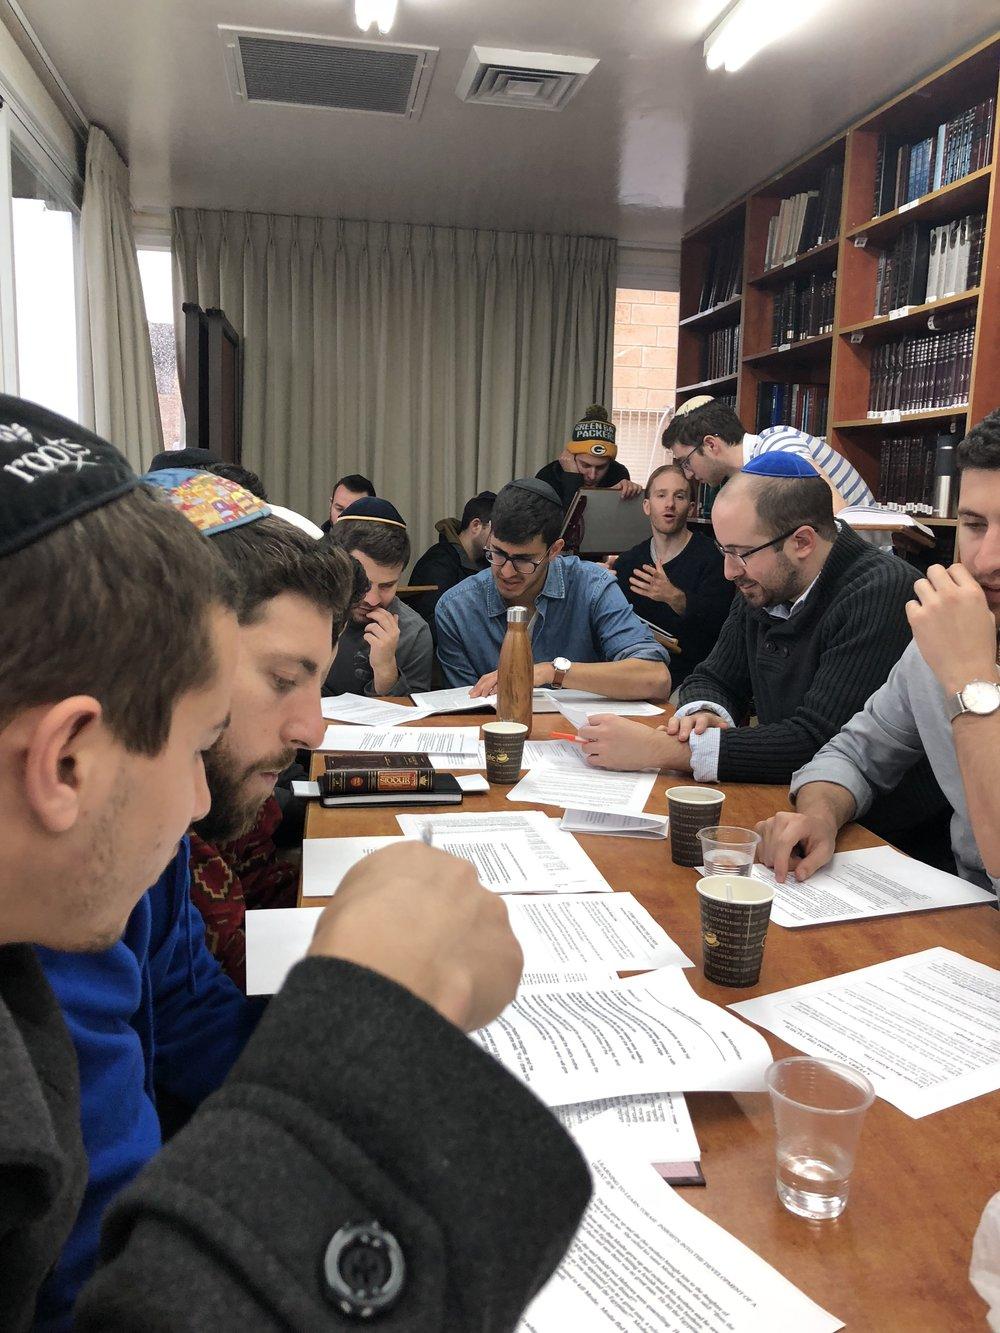 Studying at Machon Yachov Yeshiva